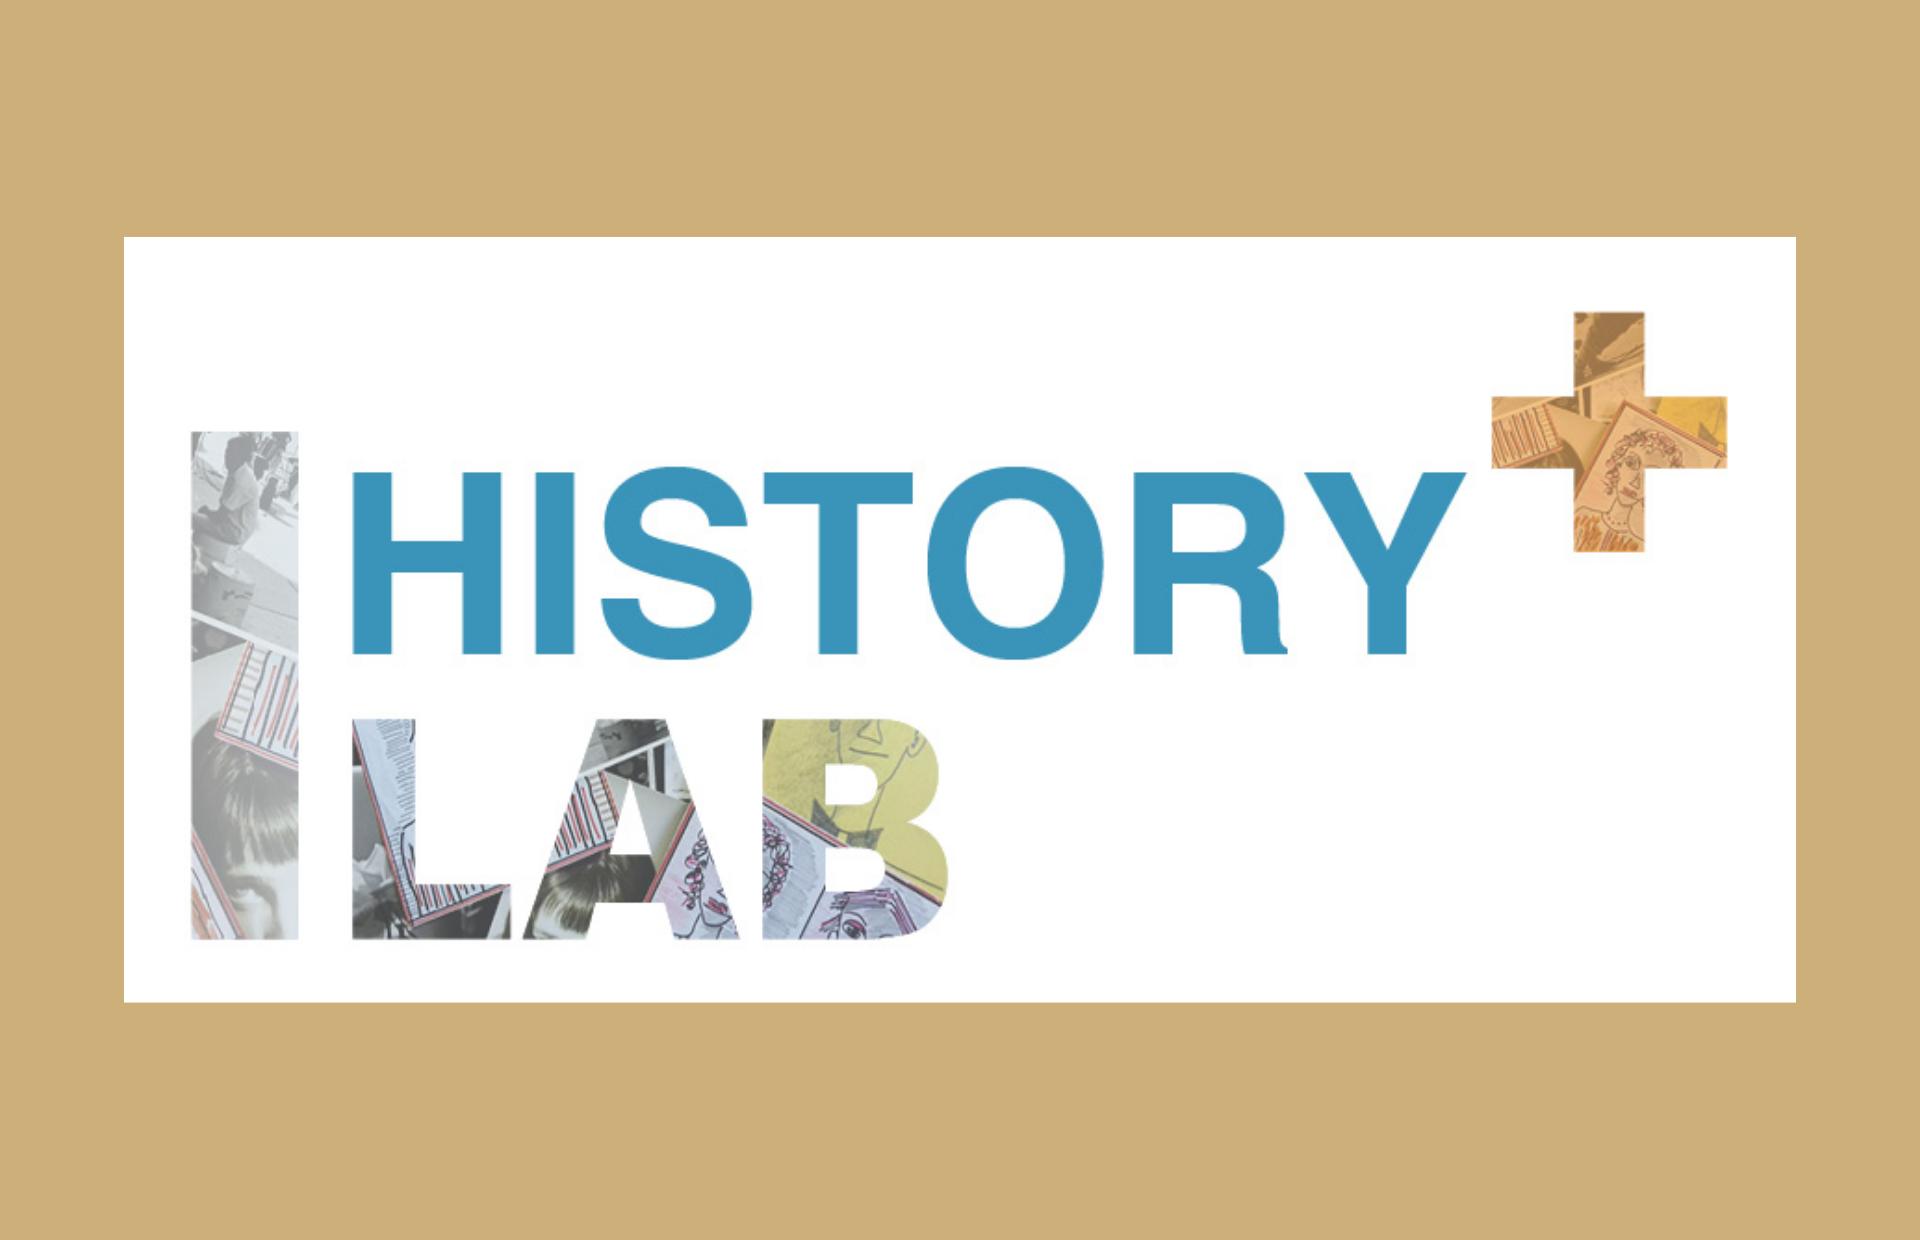 History+ Lab: Online εκπαιδευτικό πρόγραμμα εφαρμοσμένης δημόσιας ιστορίας